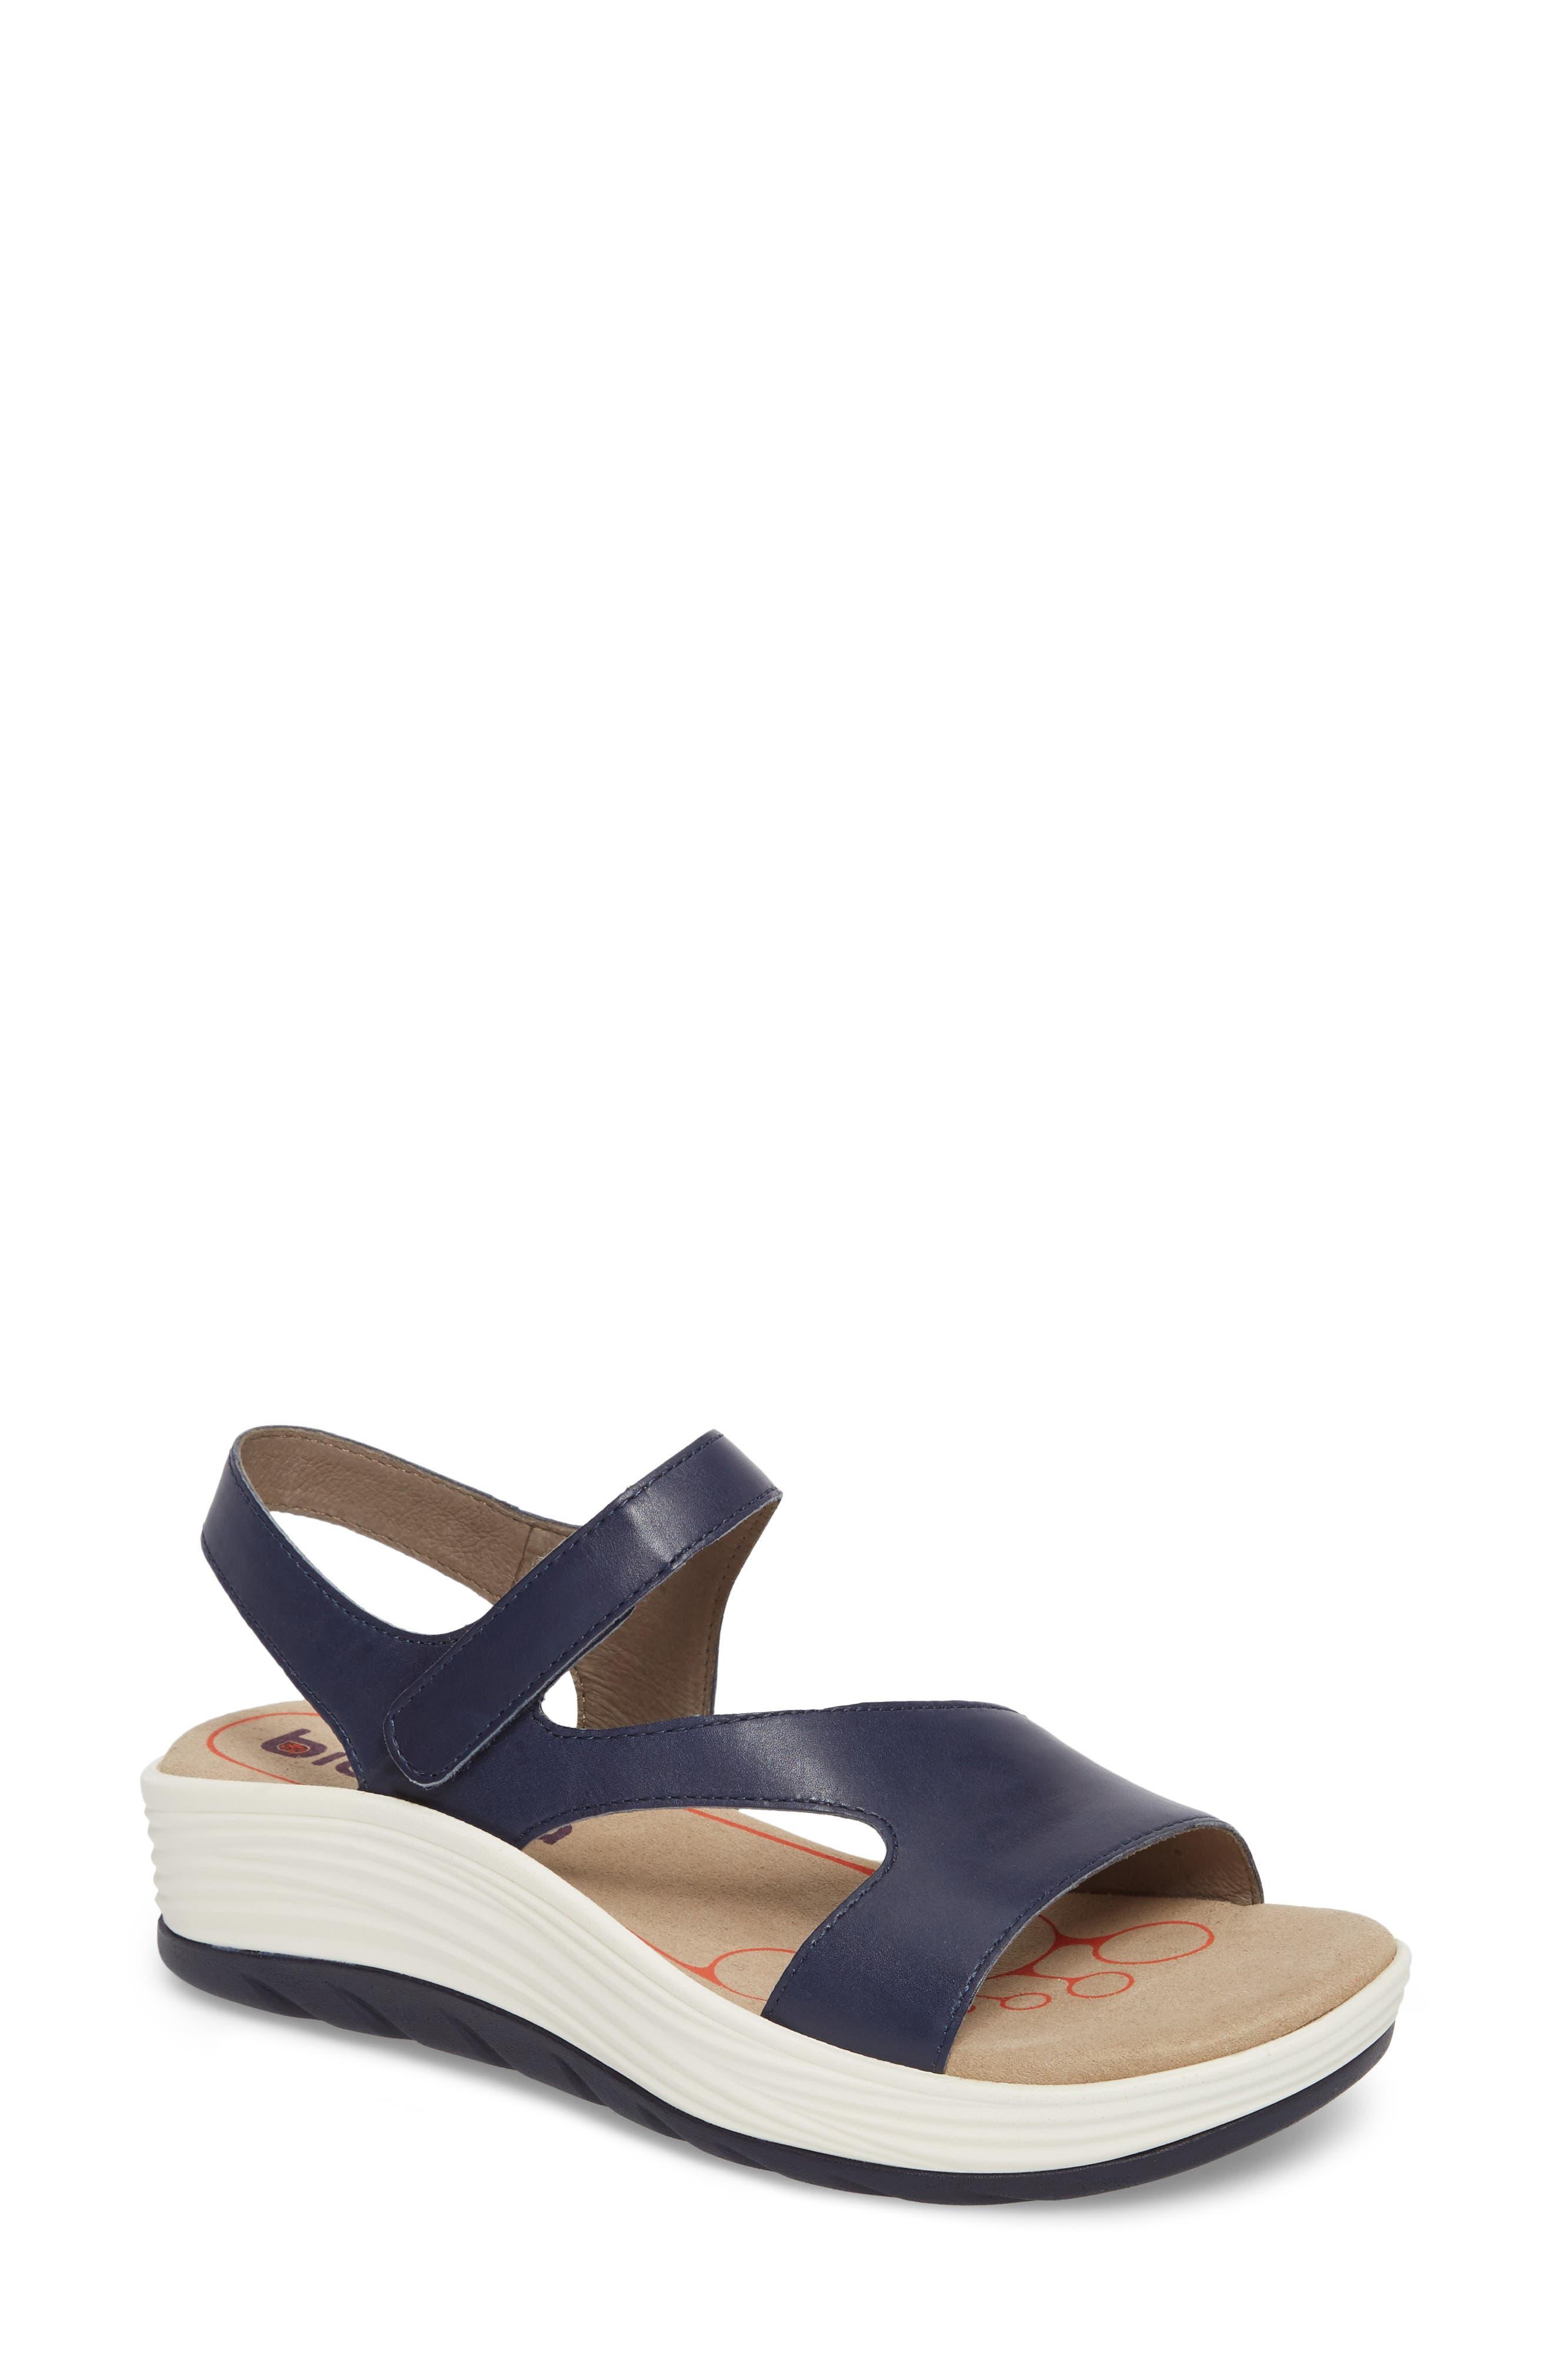 Cybele Platform Sandal,                         Main,                         color, PEACOAT NAVY LEATHER